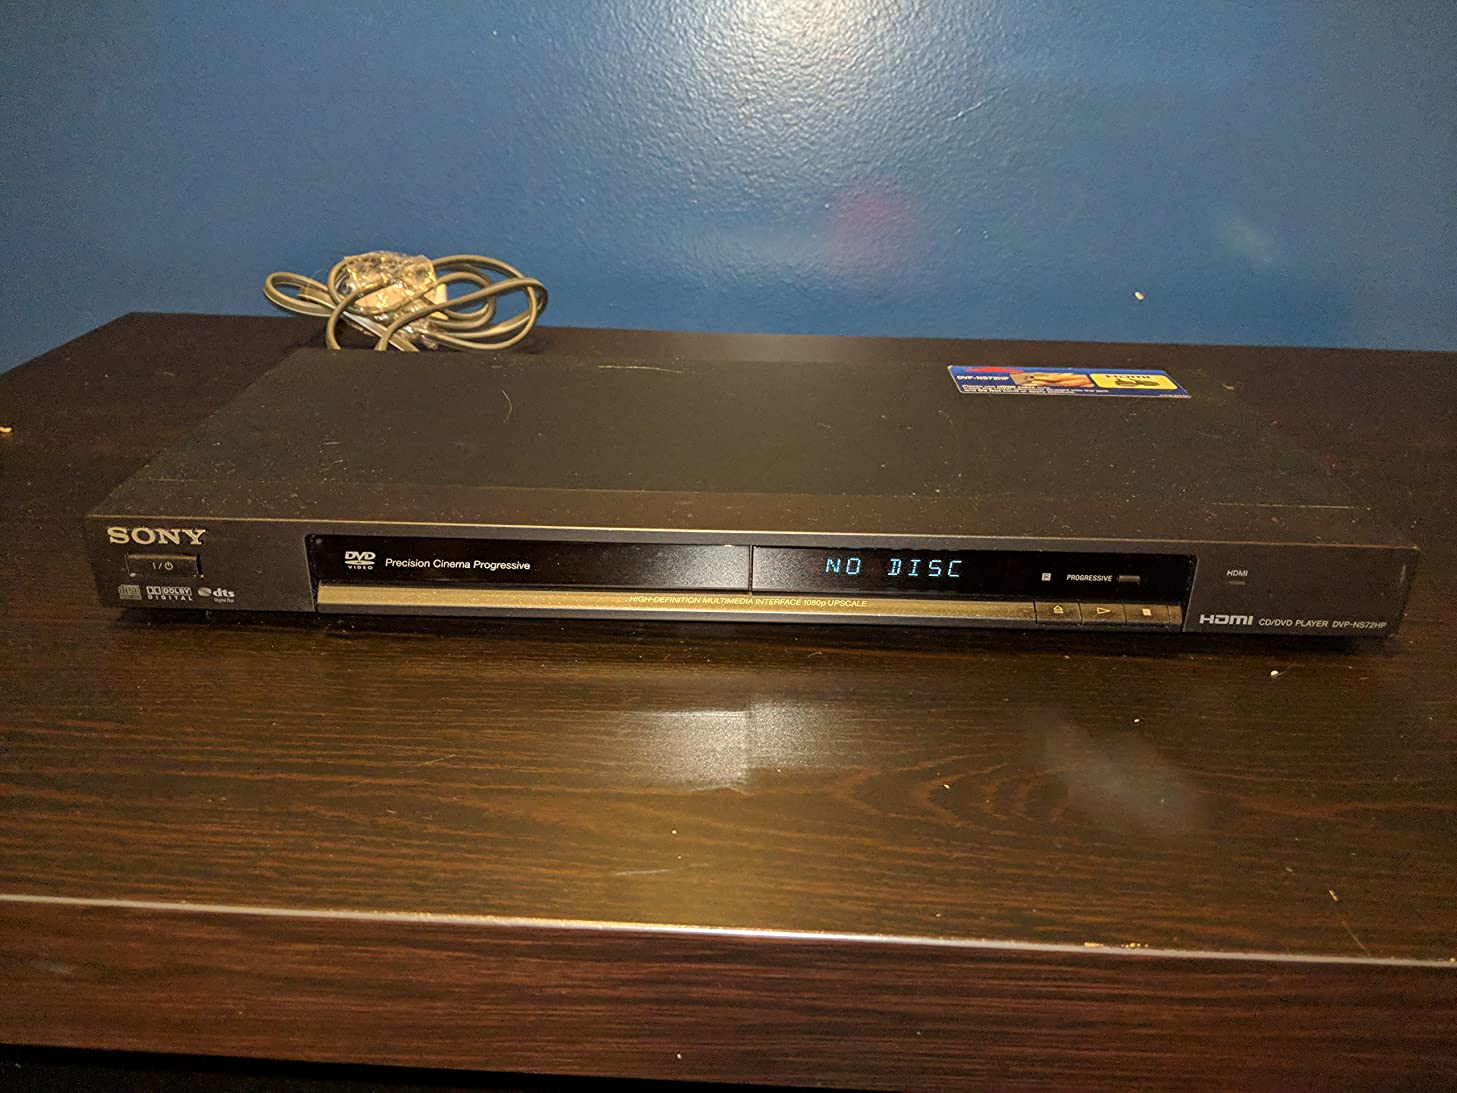 Sony DVP-NS72HP Single Disc Upscaling DVD Player - Black Finish